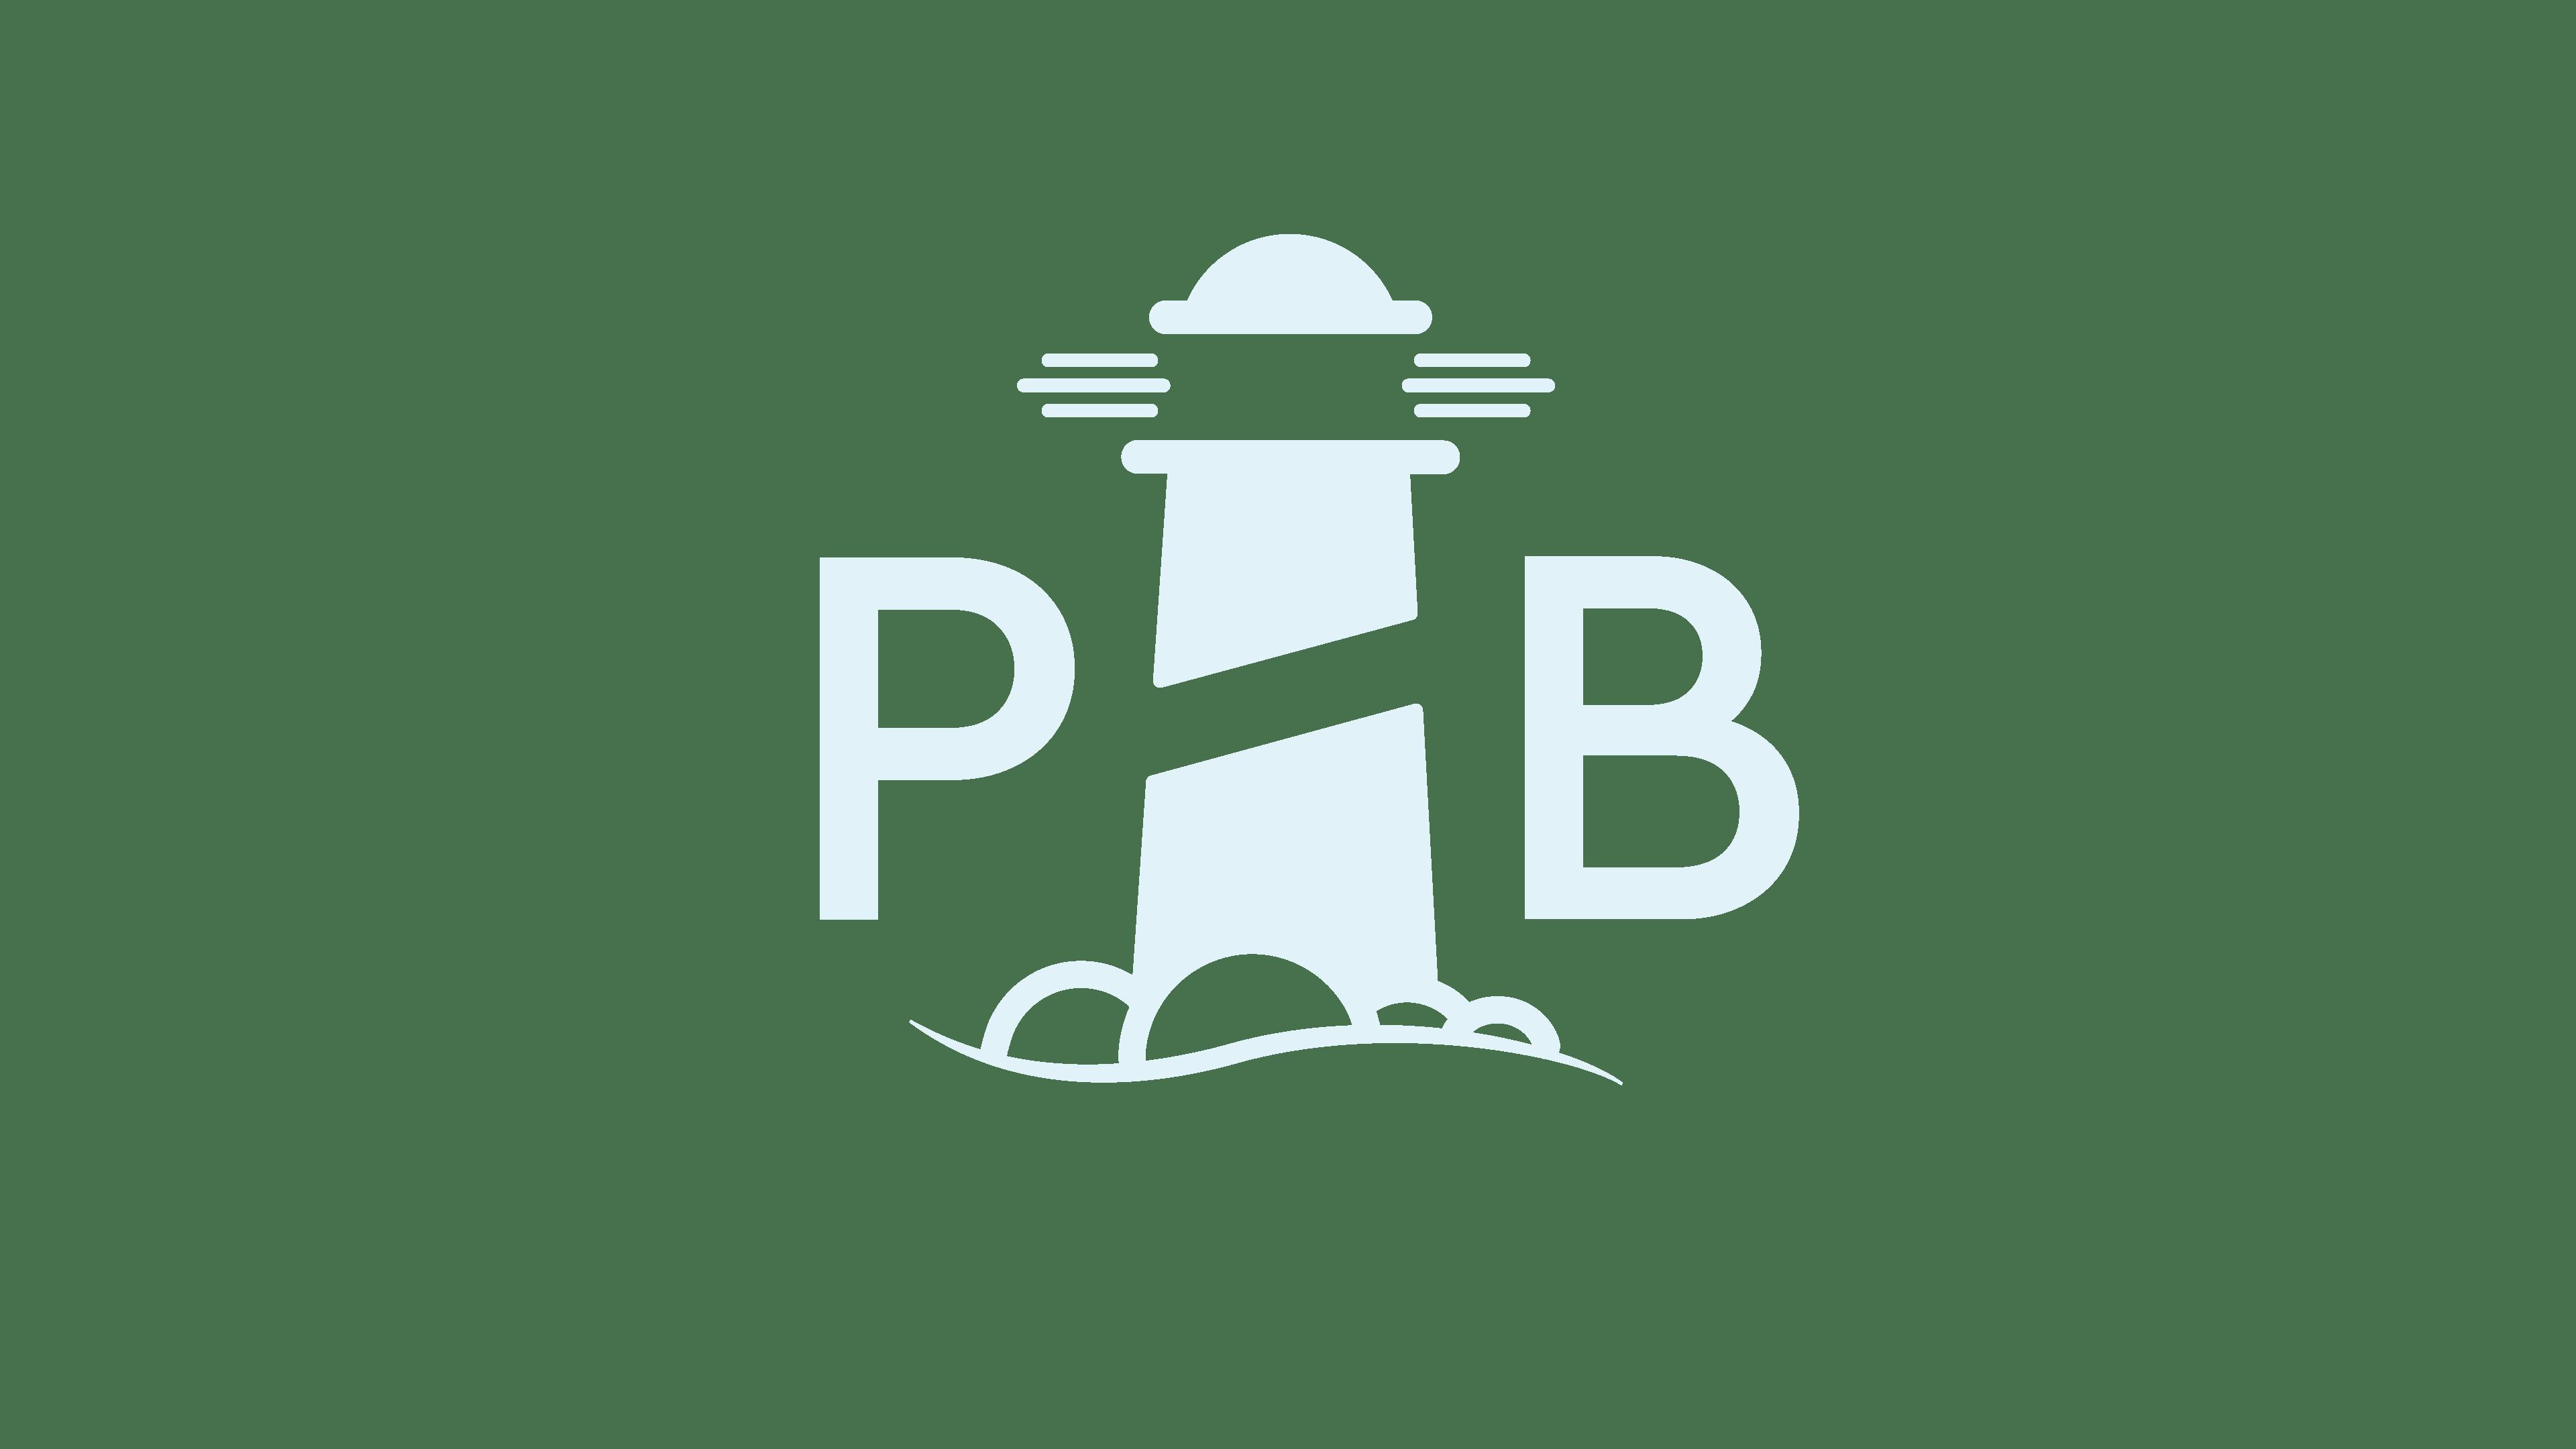 PixelBrouwers – Niels Brouwers